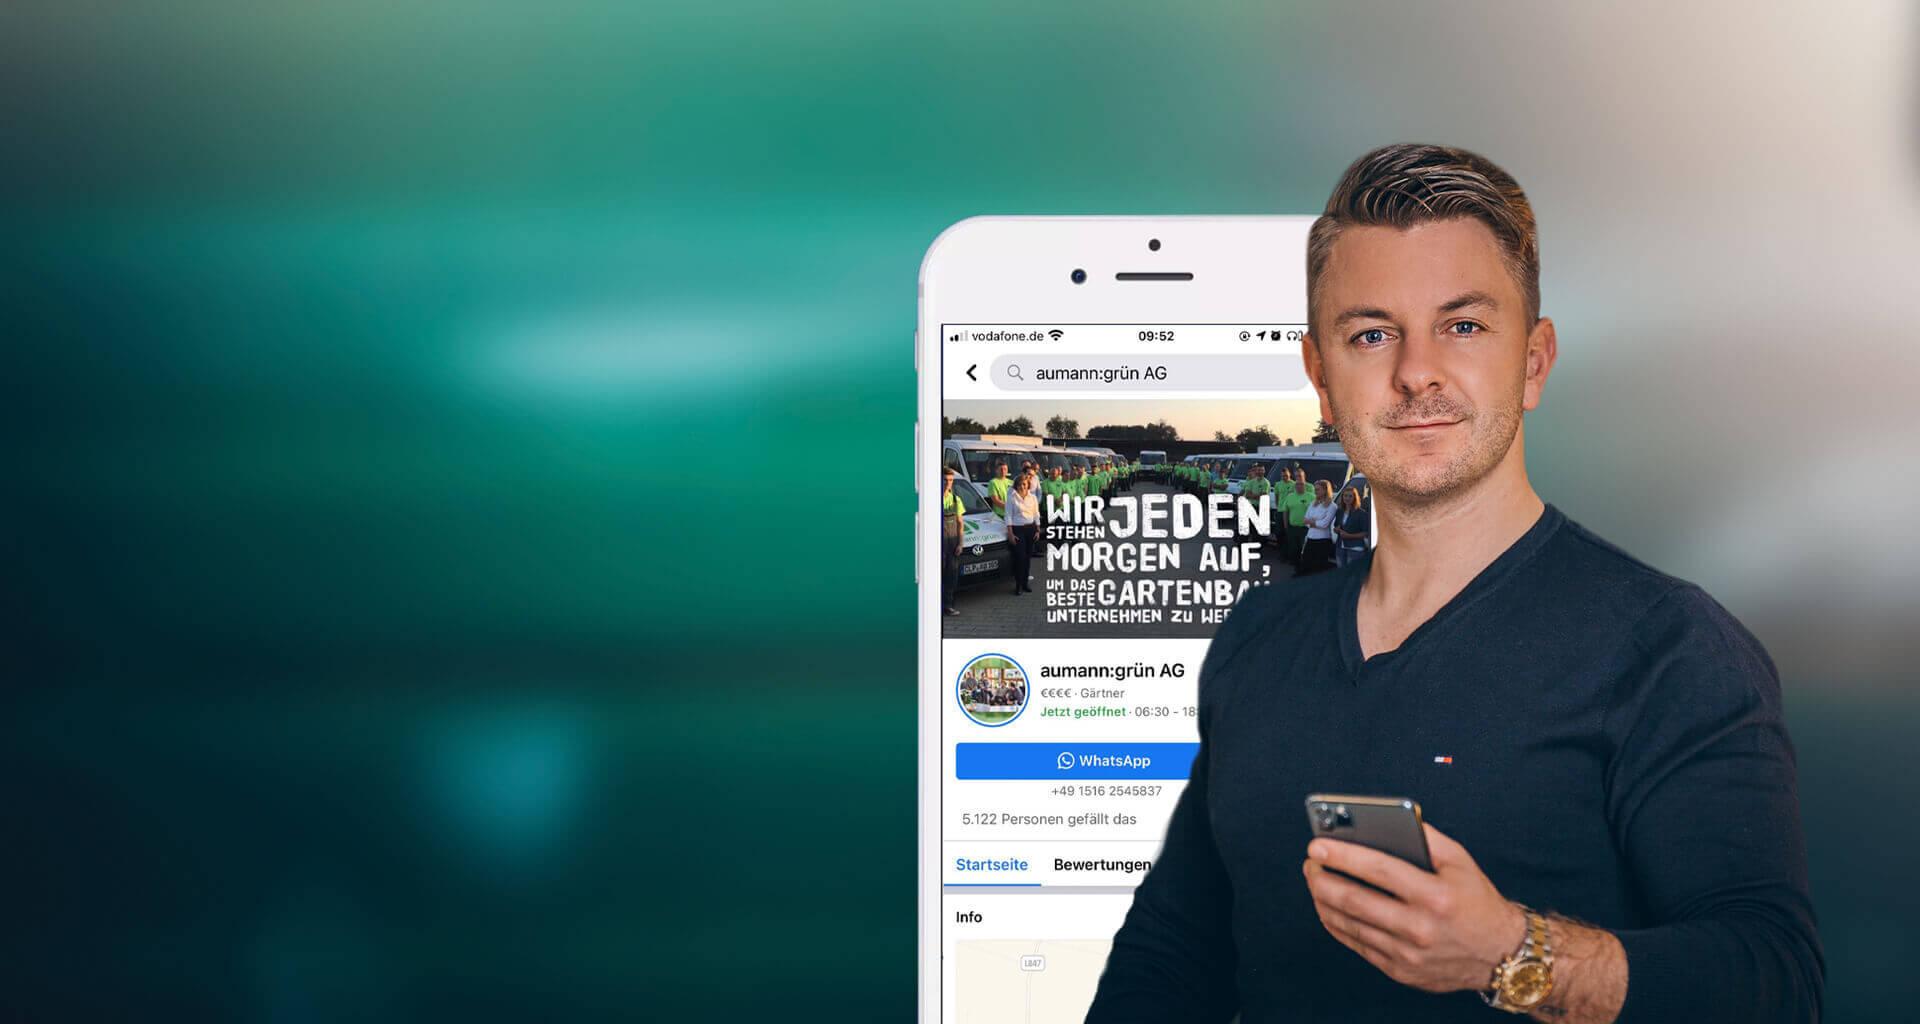 Matthias Aumann Social Media vor dem aumann:grün AG Facebook Account